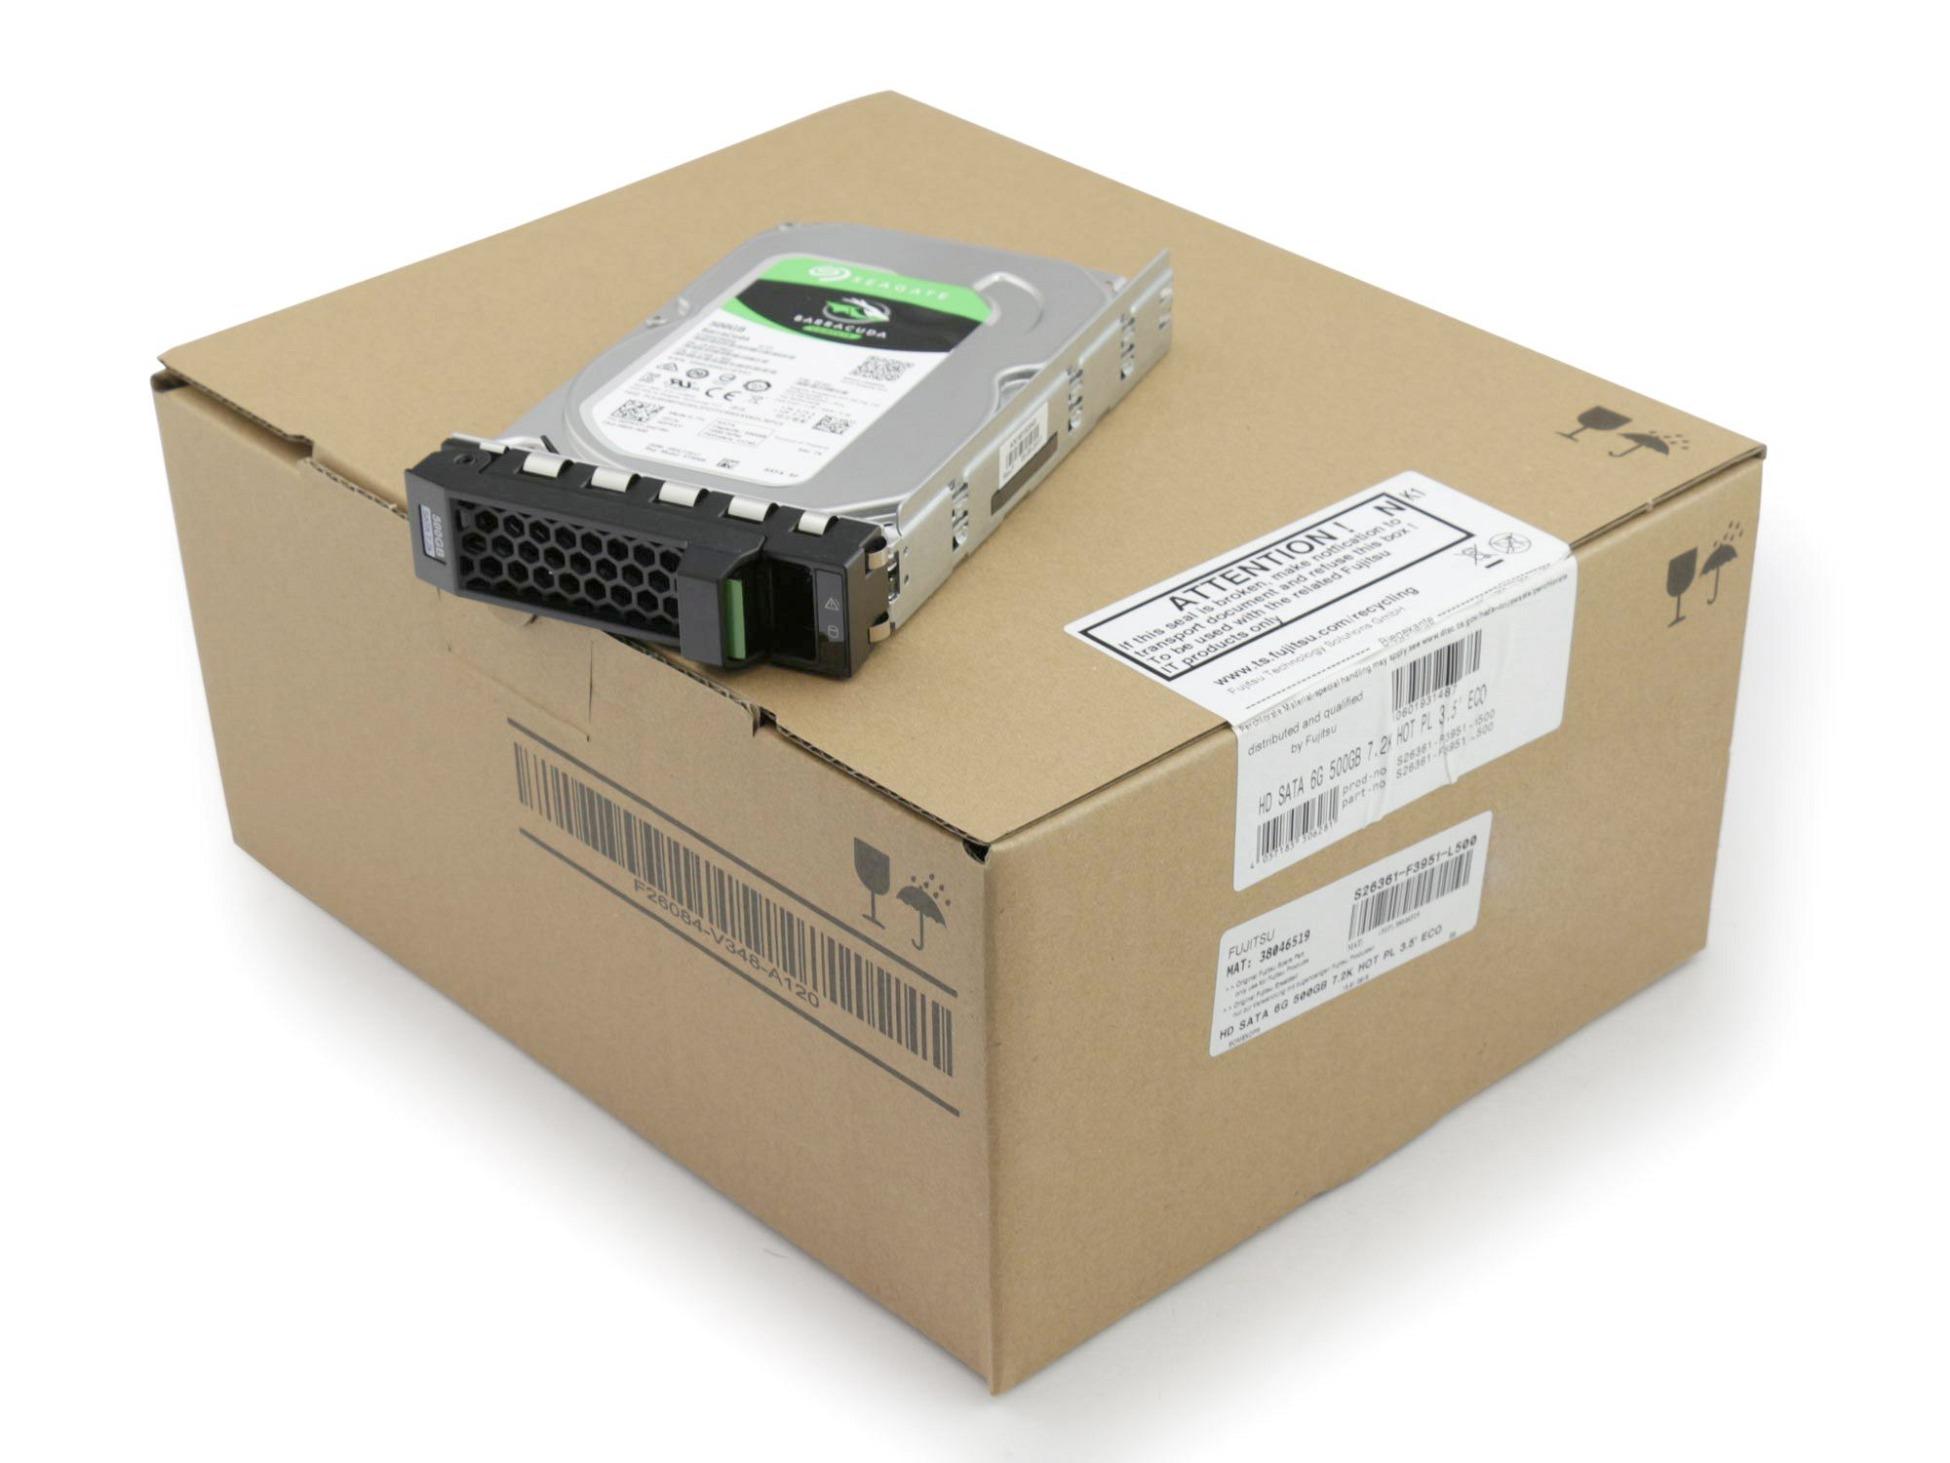 Seagate ST500DM002 Server Festplatte HDD 500GB (3,5 Zoll / 8,9 cm) S-ATA III (6,0 Gb/s) ECO 7.2K inkl. Hot-Plug